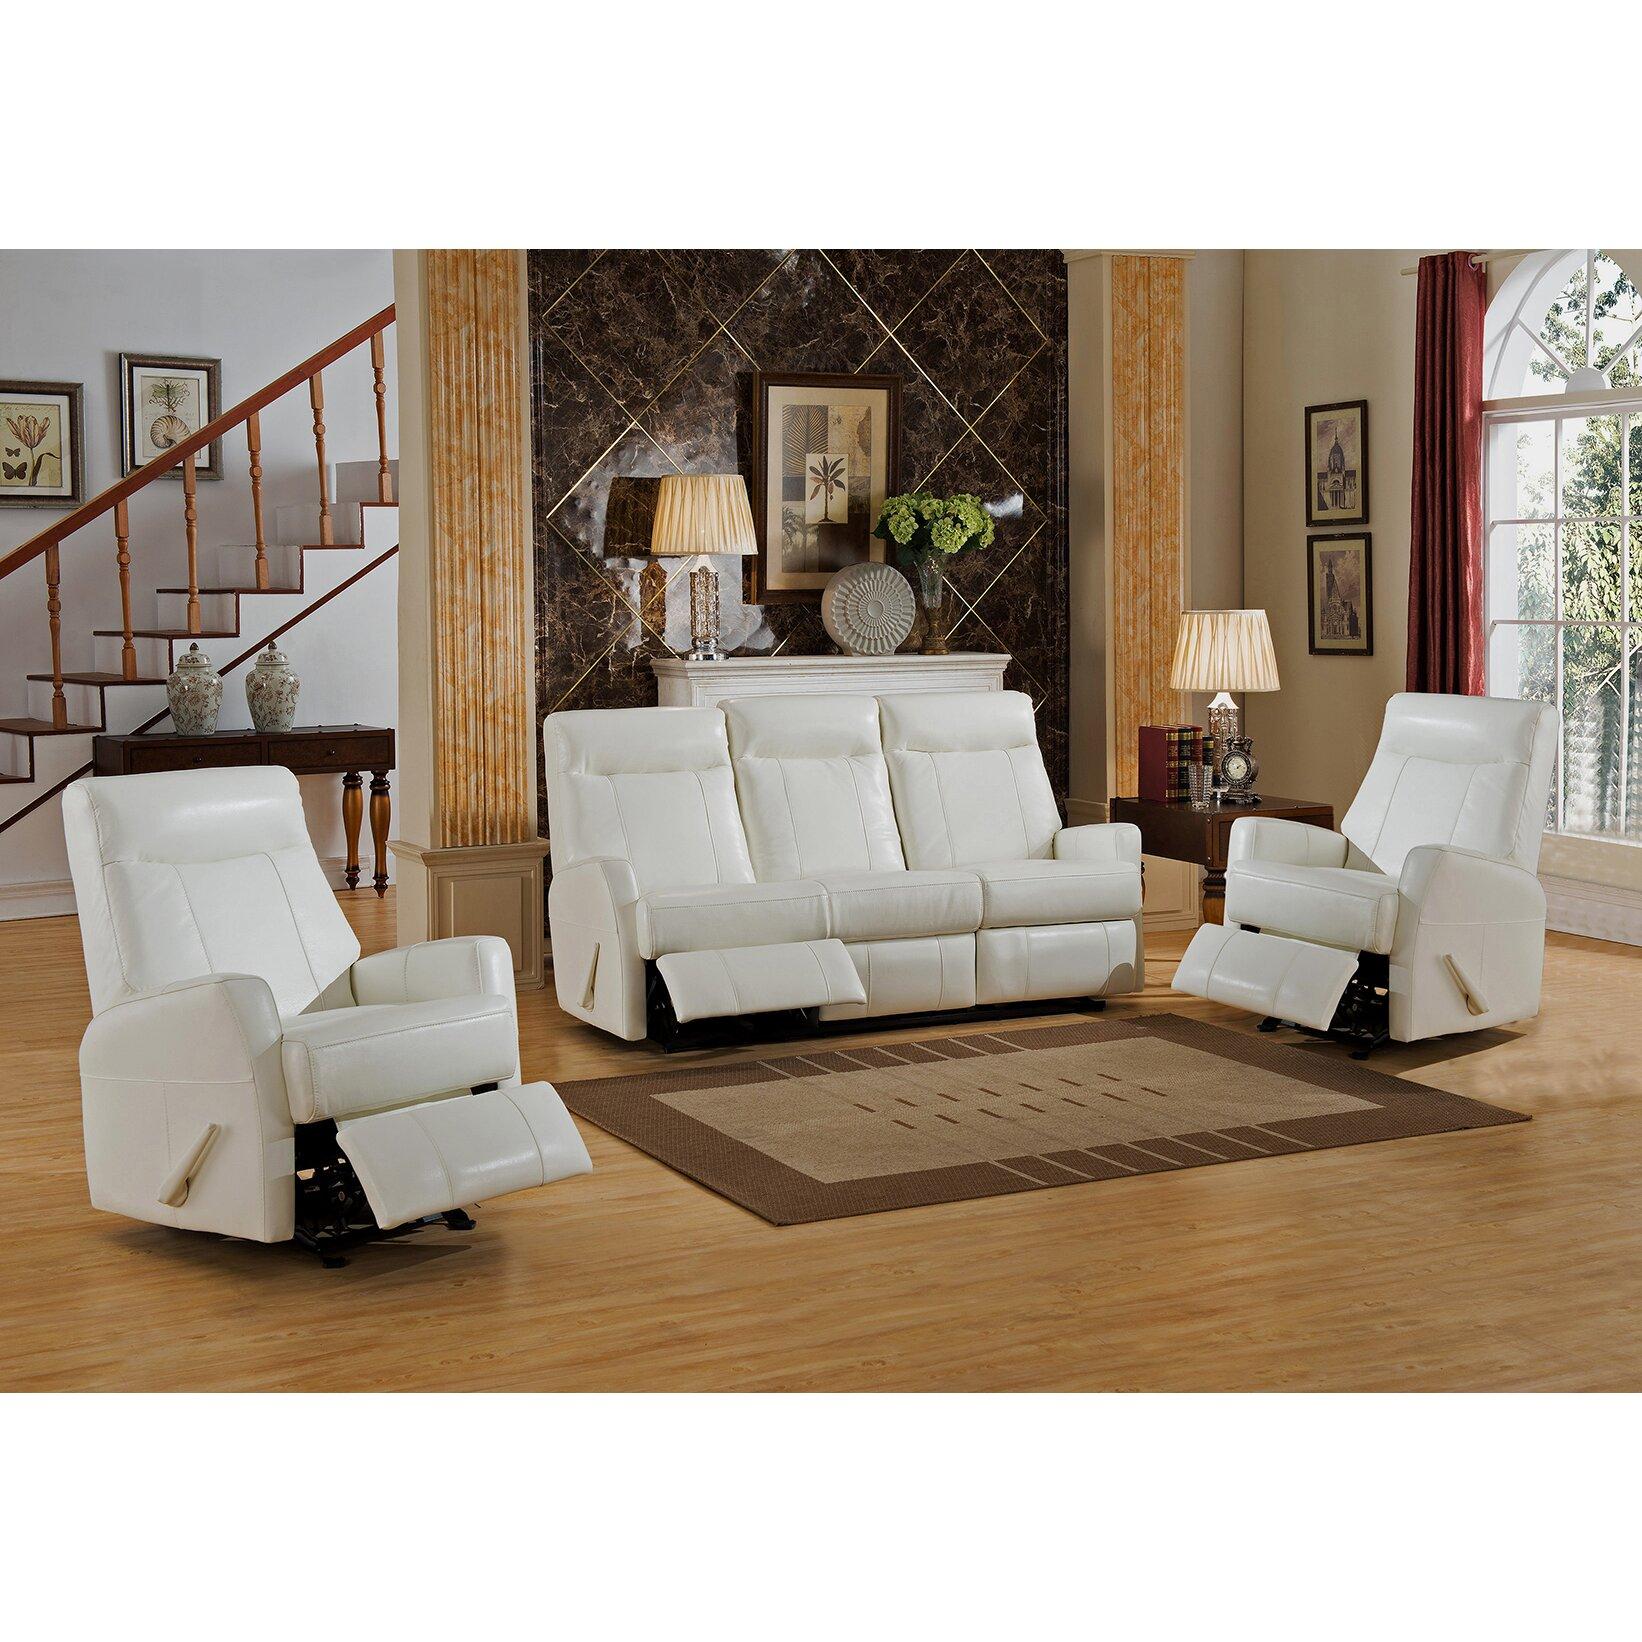 amax toledo 3 piece leather living room set wayfair. Black Bedroom Furniture Sets. Home Design Ideas